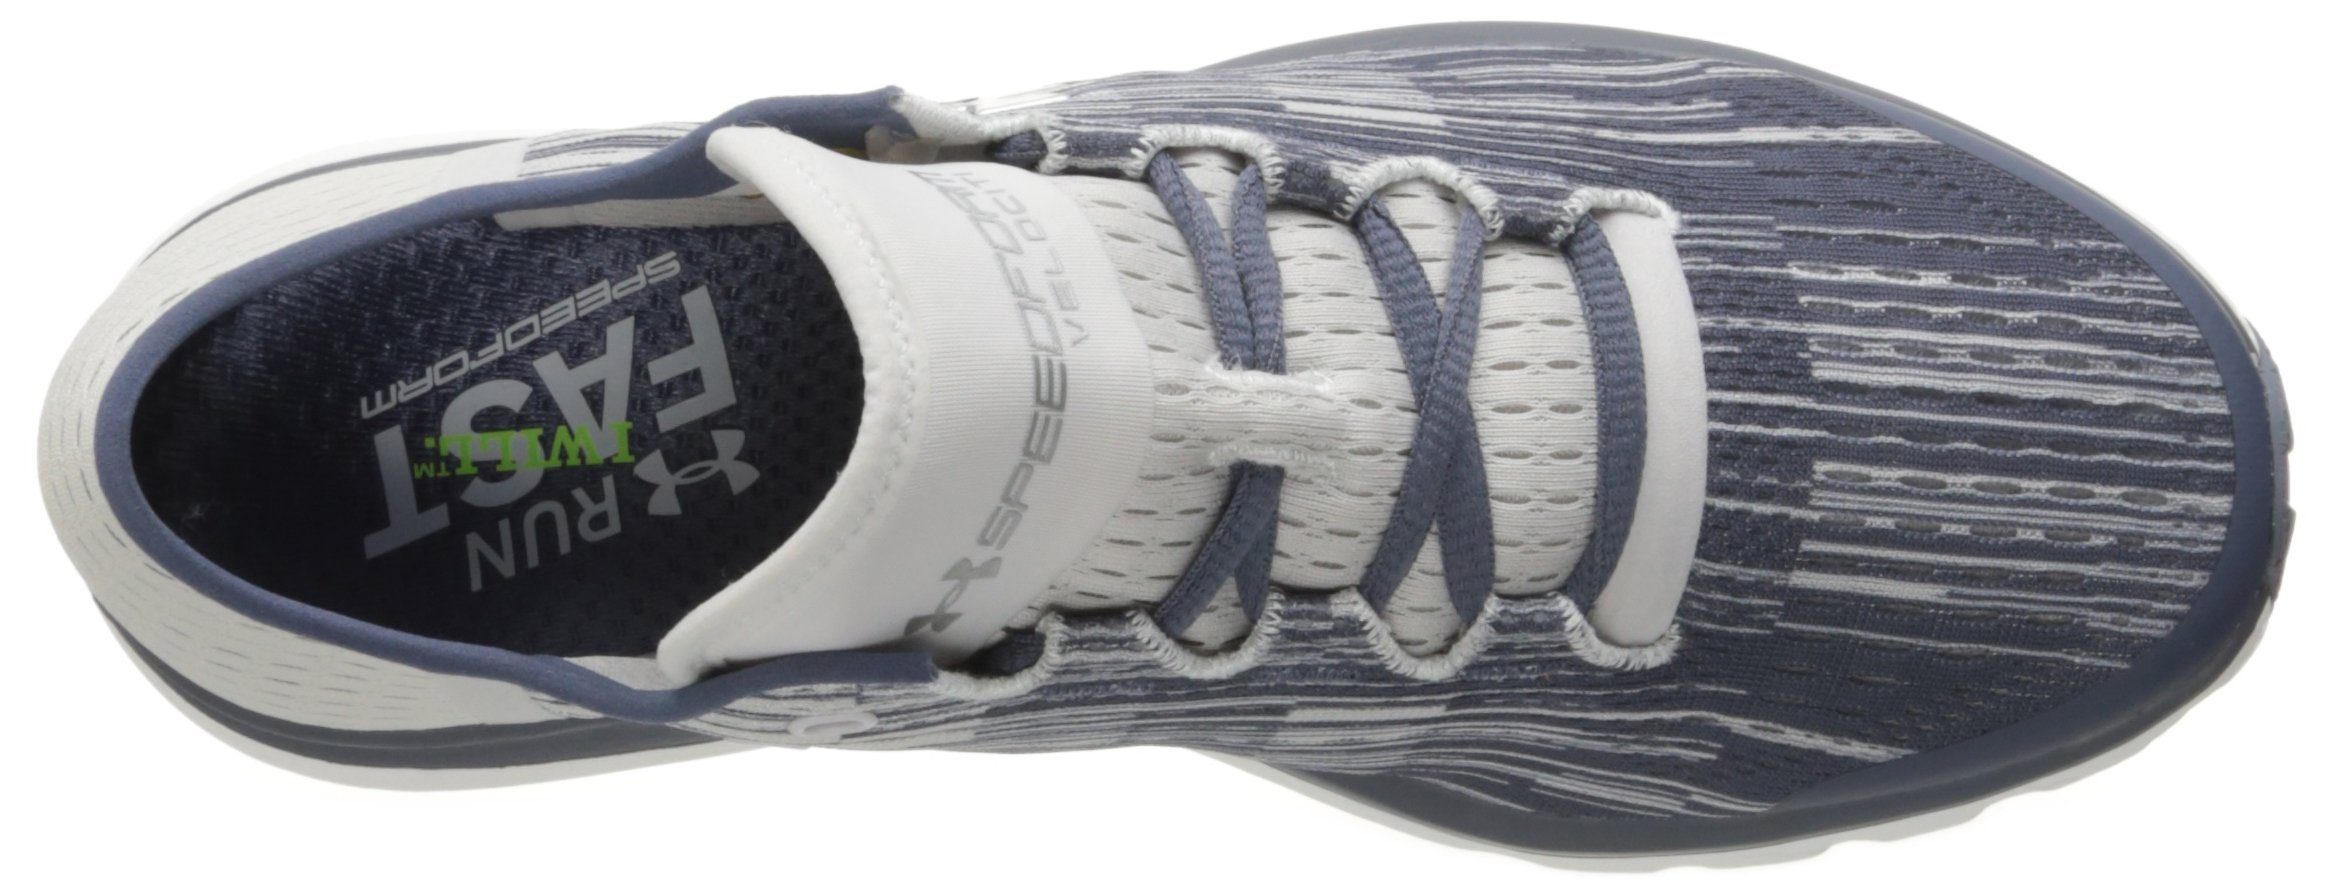 Under Armour Men's Women's Speedform Velociti Running Shoe, 1.5 UK